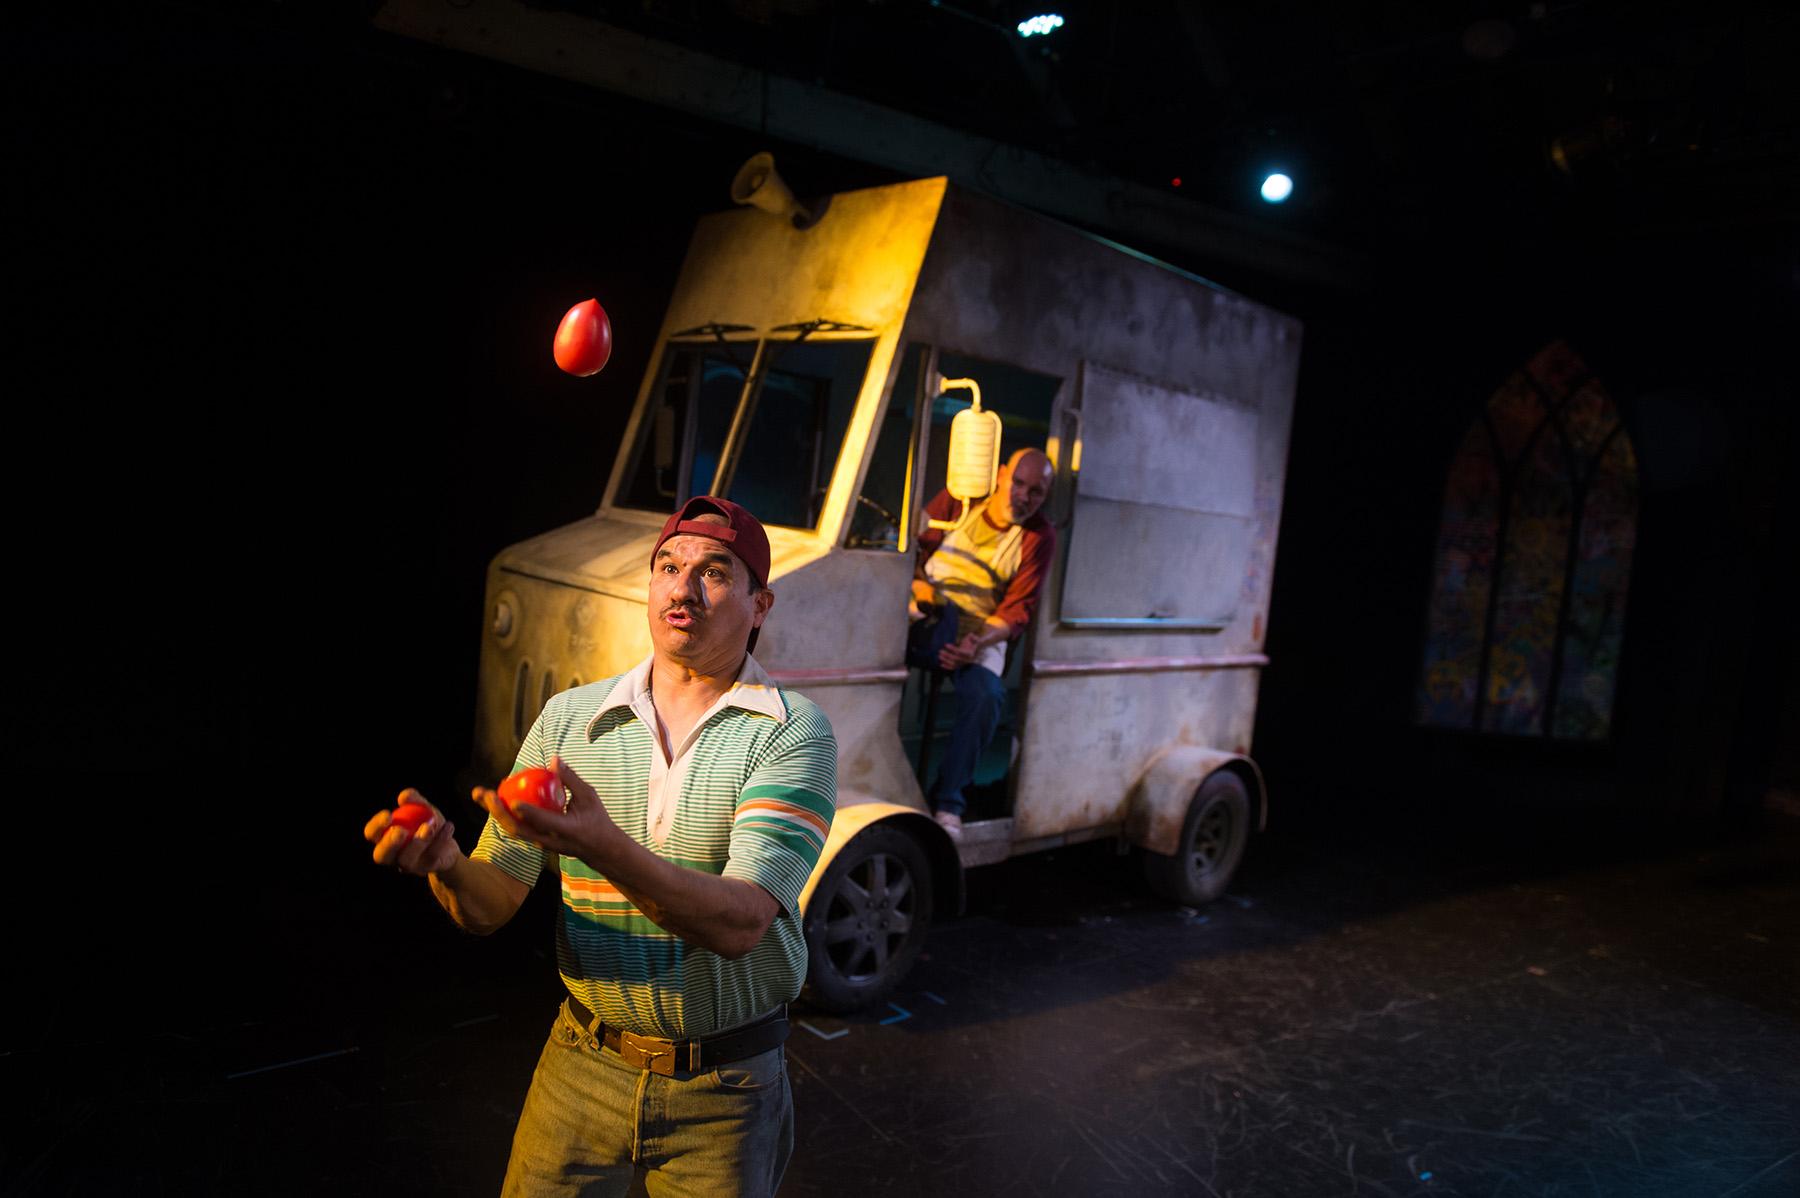 Juggling Foreground Jesús Castaños-Chima and Tony Dúran Photo by Cooper Bates.jpg